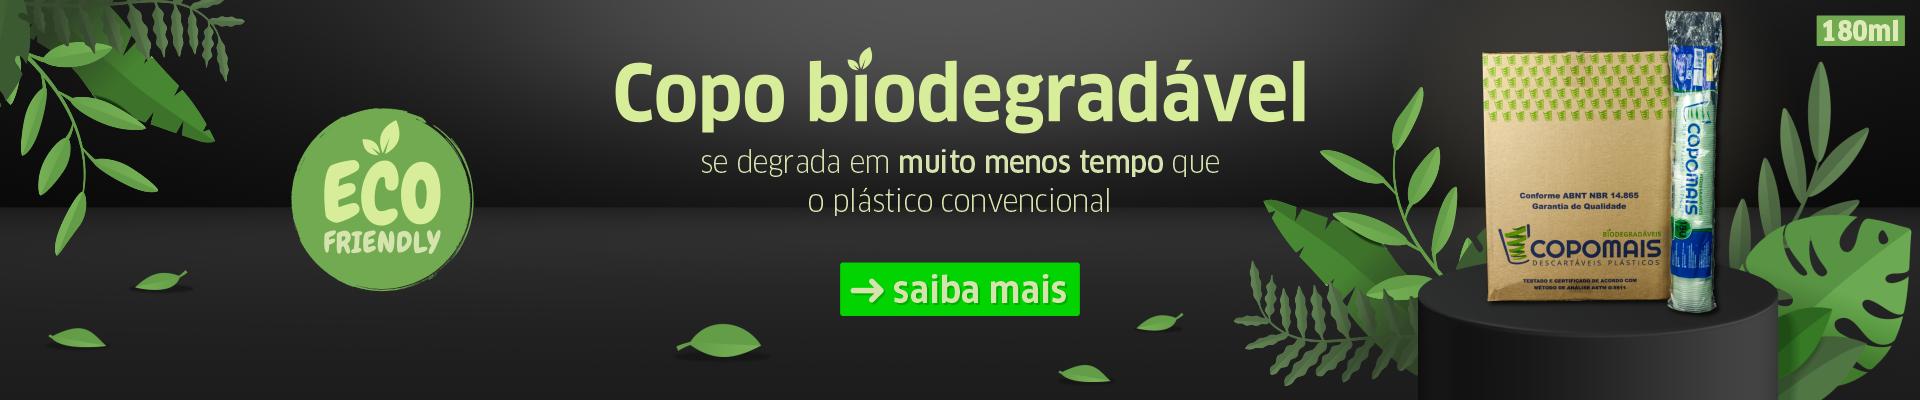 Copo Biodegradável 180ml Eco Friendly